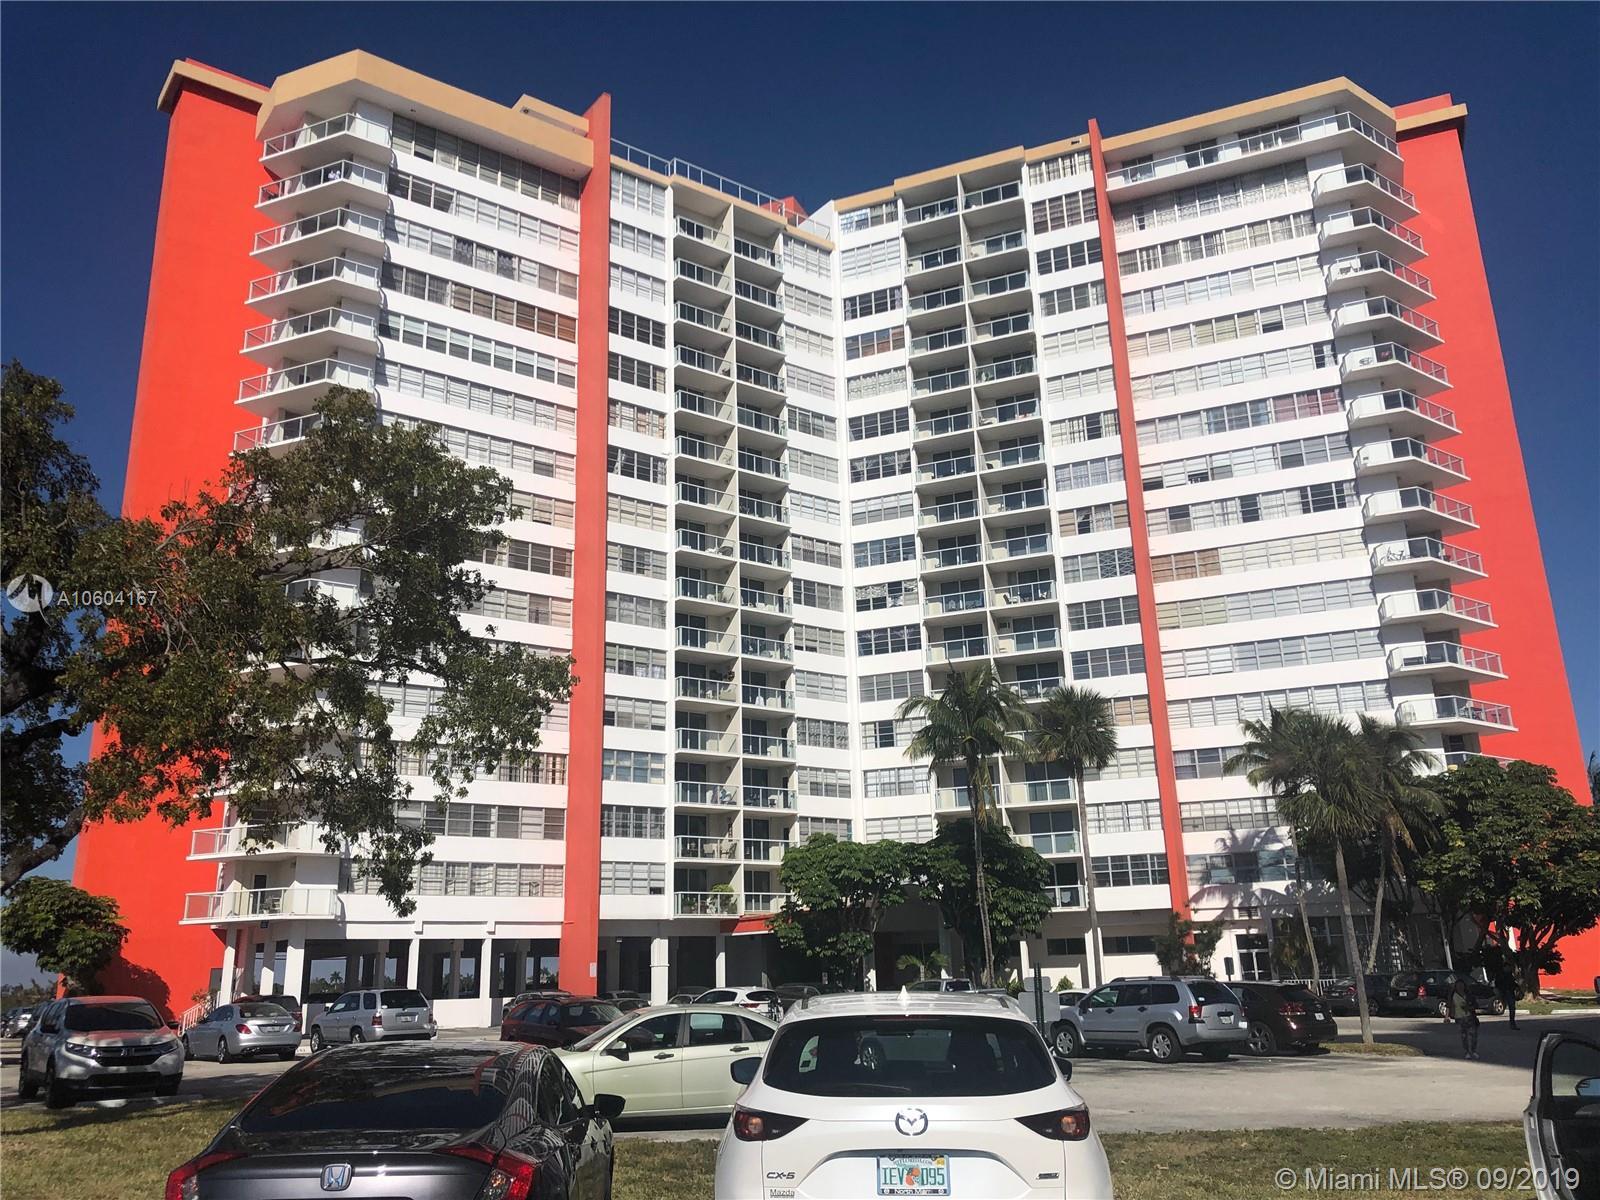 1301 Ne Miami Gardens Dr Miami, FL 33179